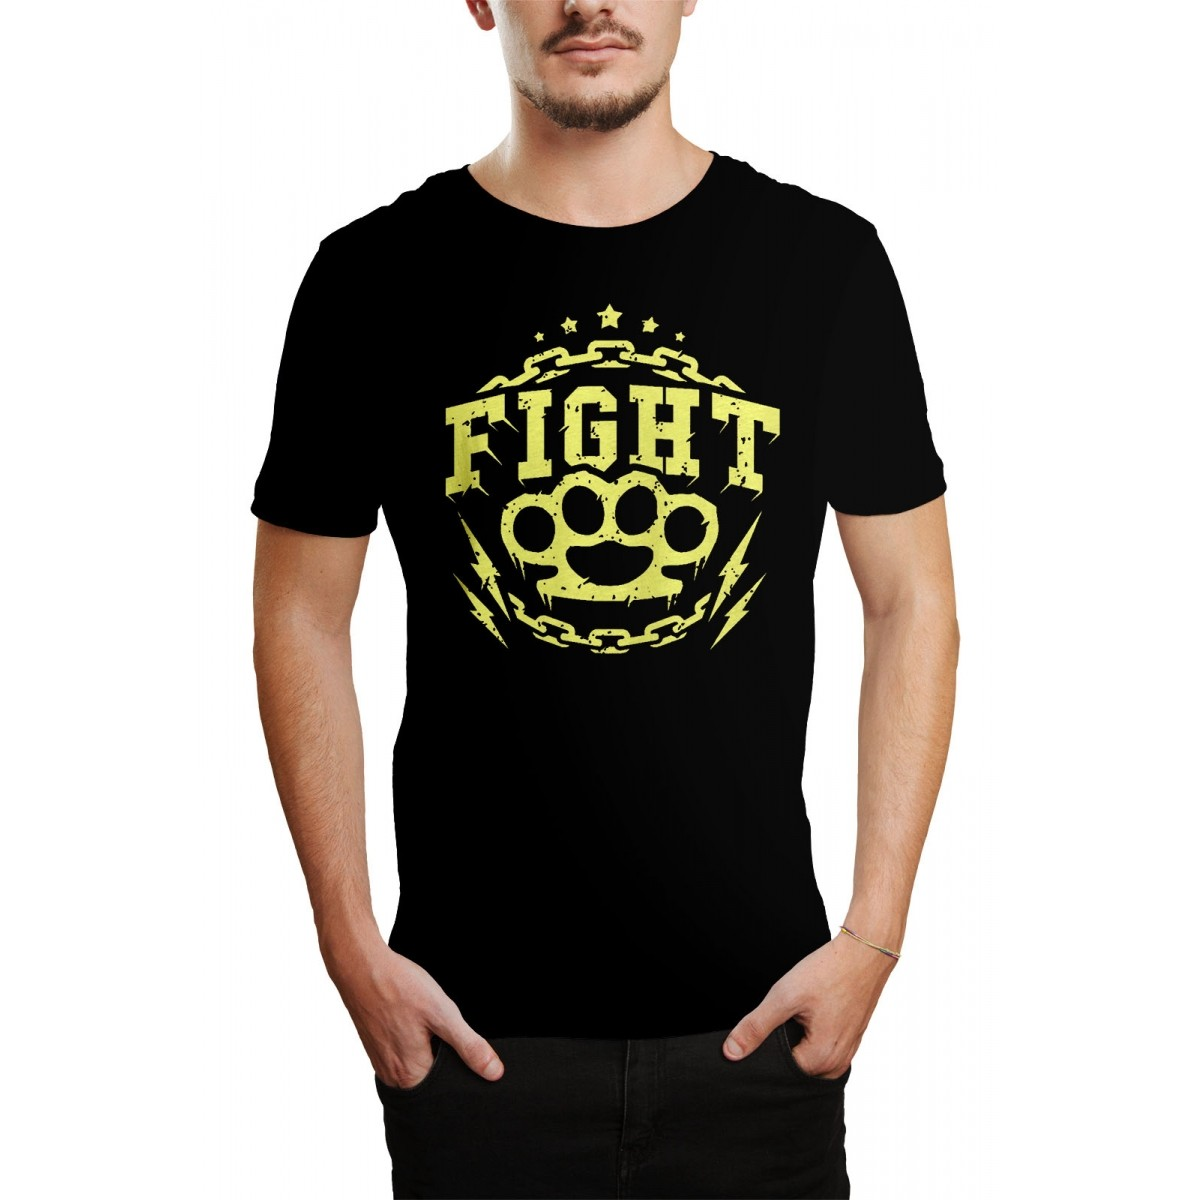 Camiseta HShop Fight! Preto  - HShop